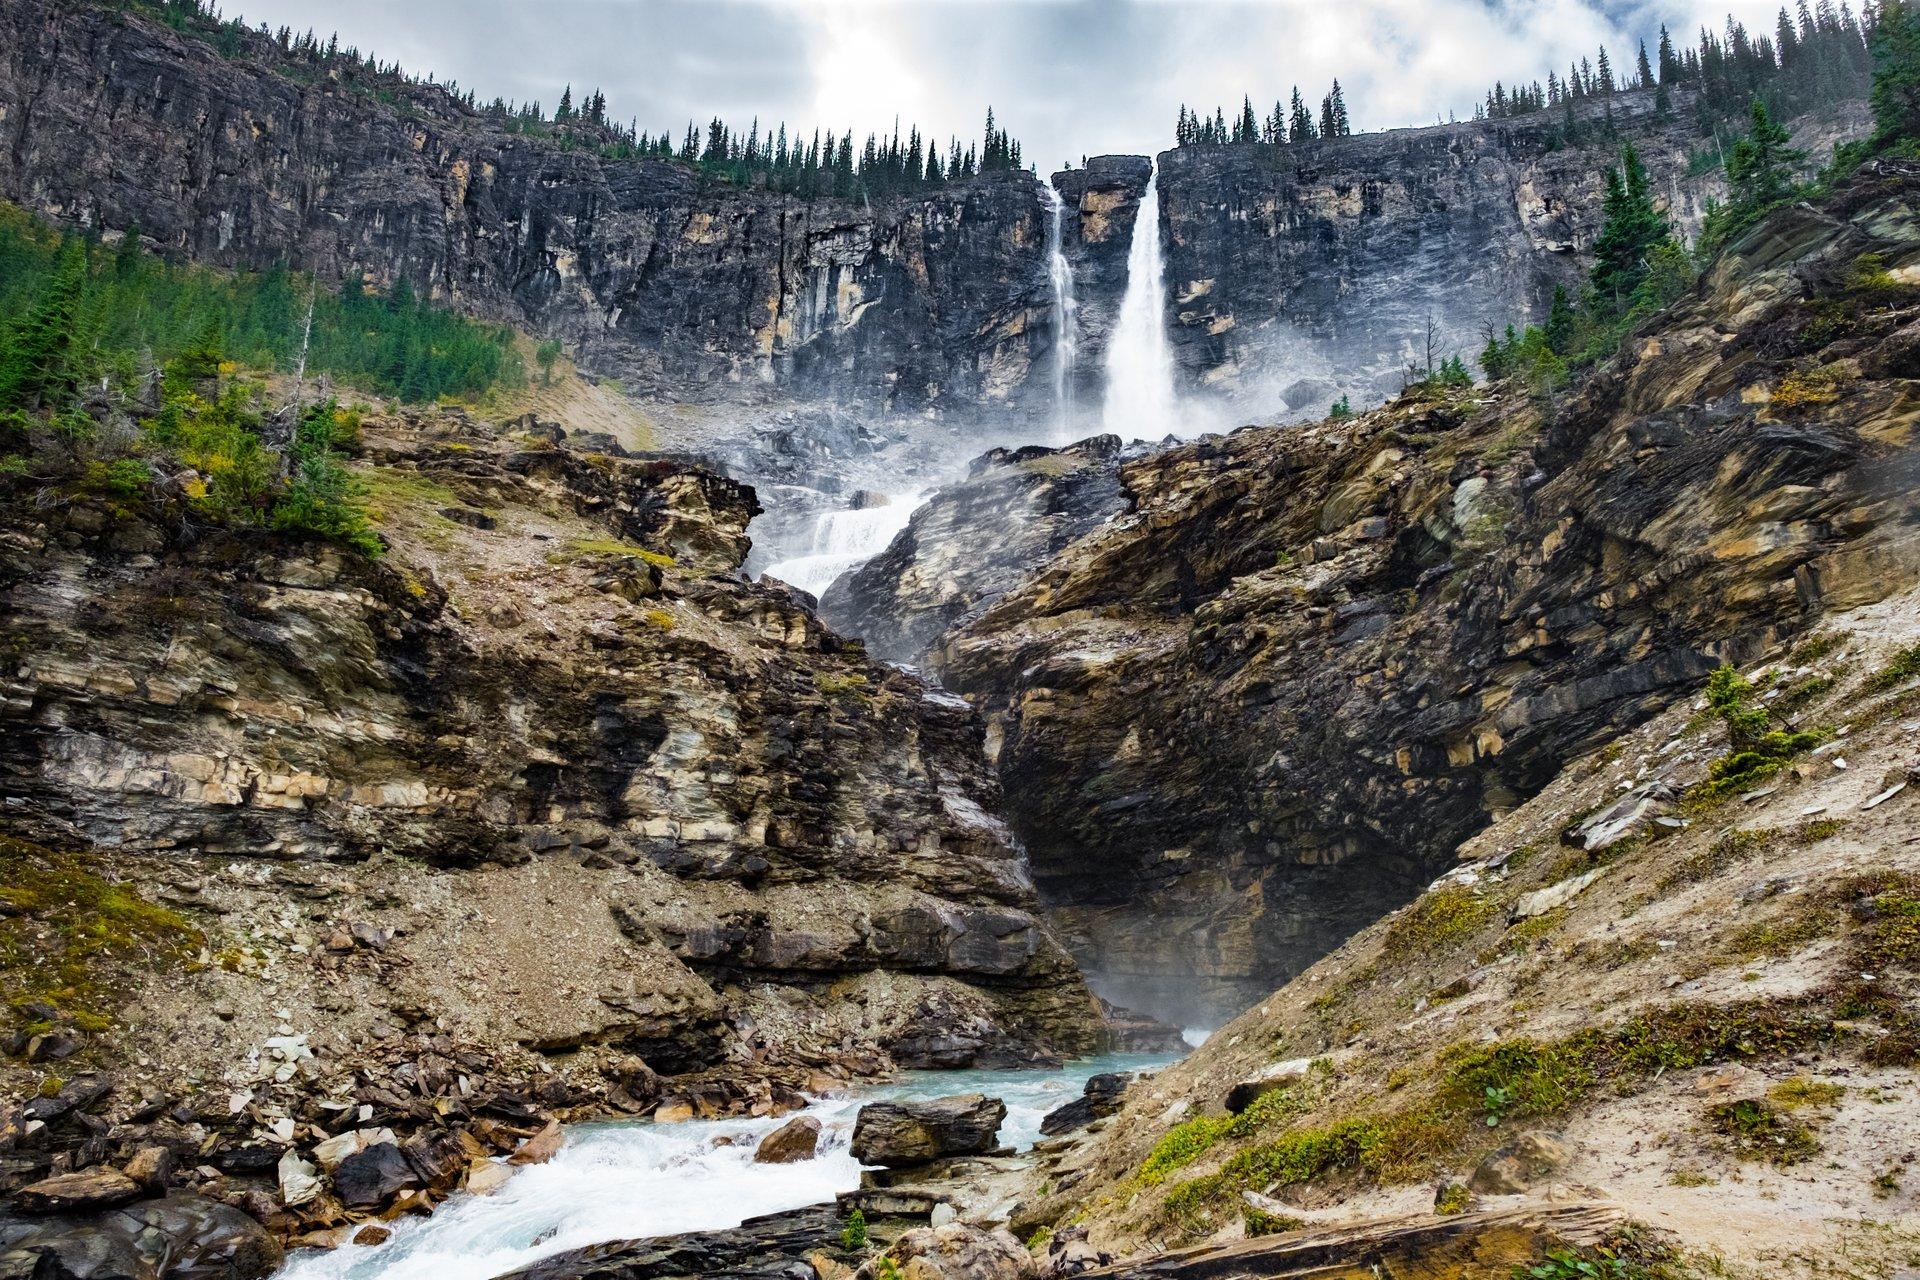 Twin Falls 2020